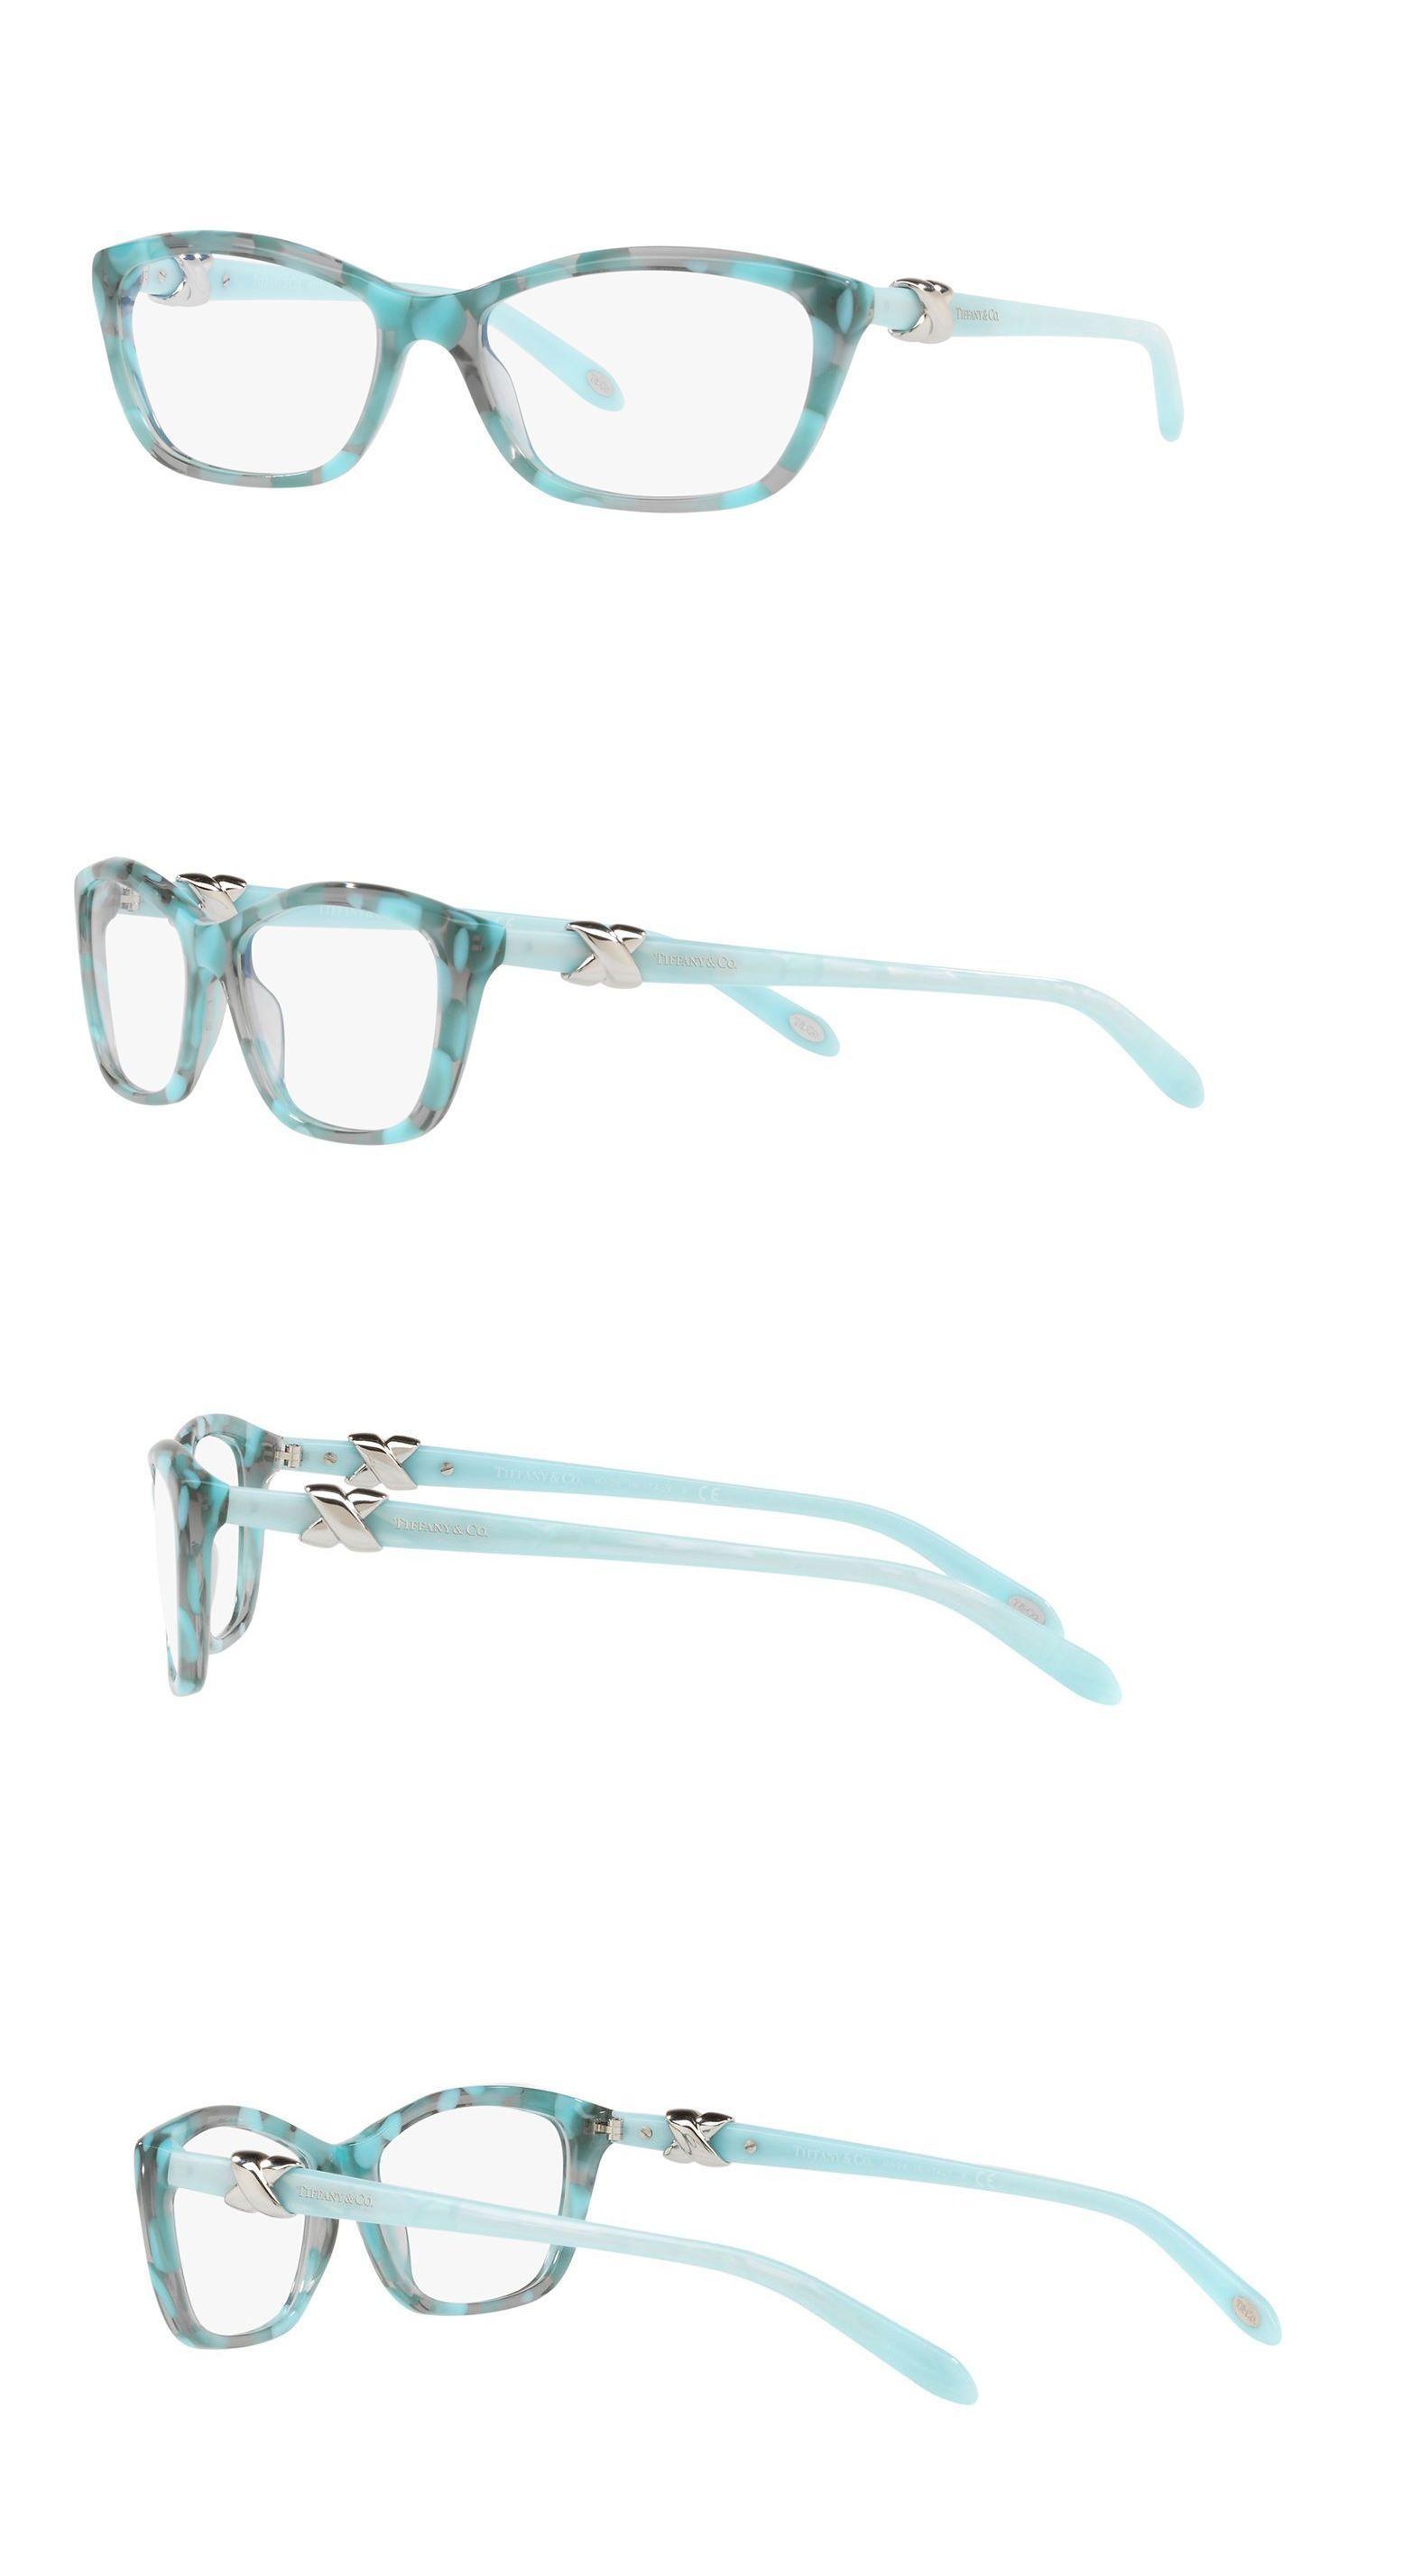 43cd113f503 Eyeglass Frames 180957   New Authentic  Tiffany And Co. Tf2074 8239 Pois  Black Blue Eyeglass Frame -  BUY IT NOW ONLY   155.99 on  eBay  eyeglass   frames ...